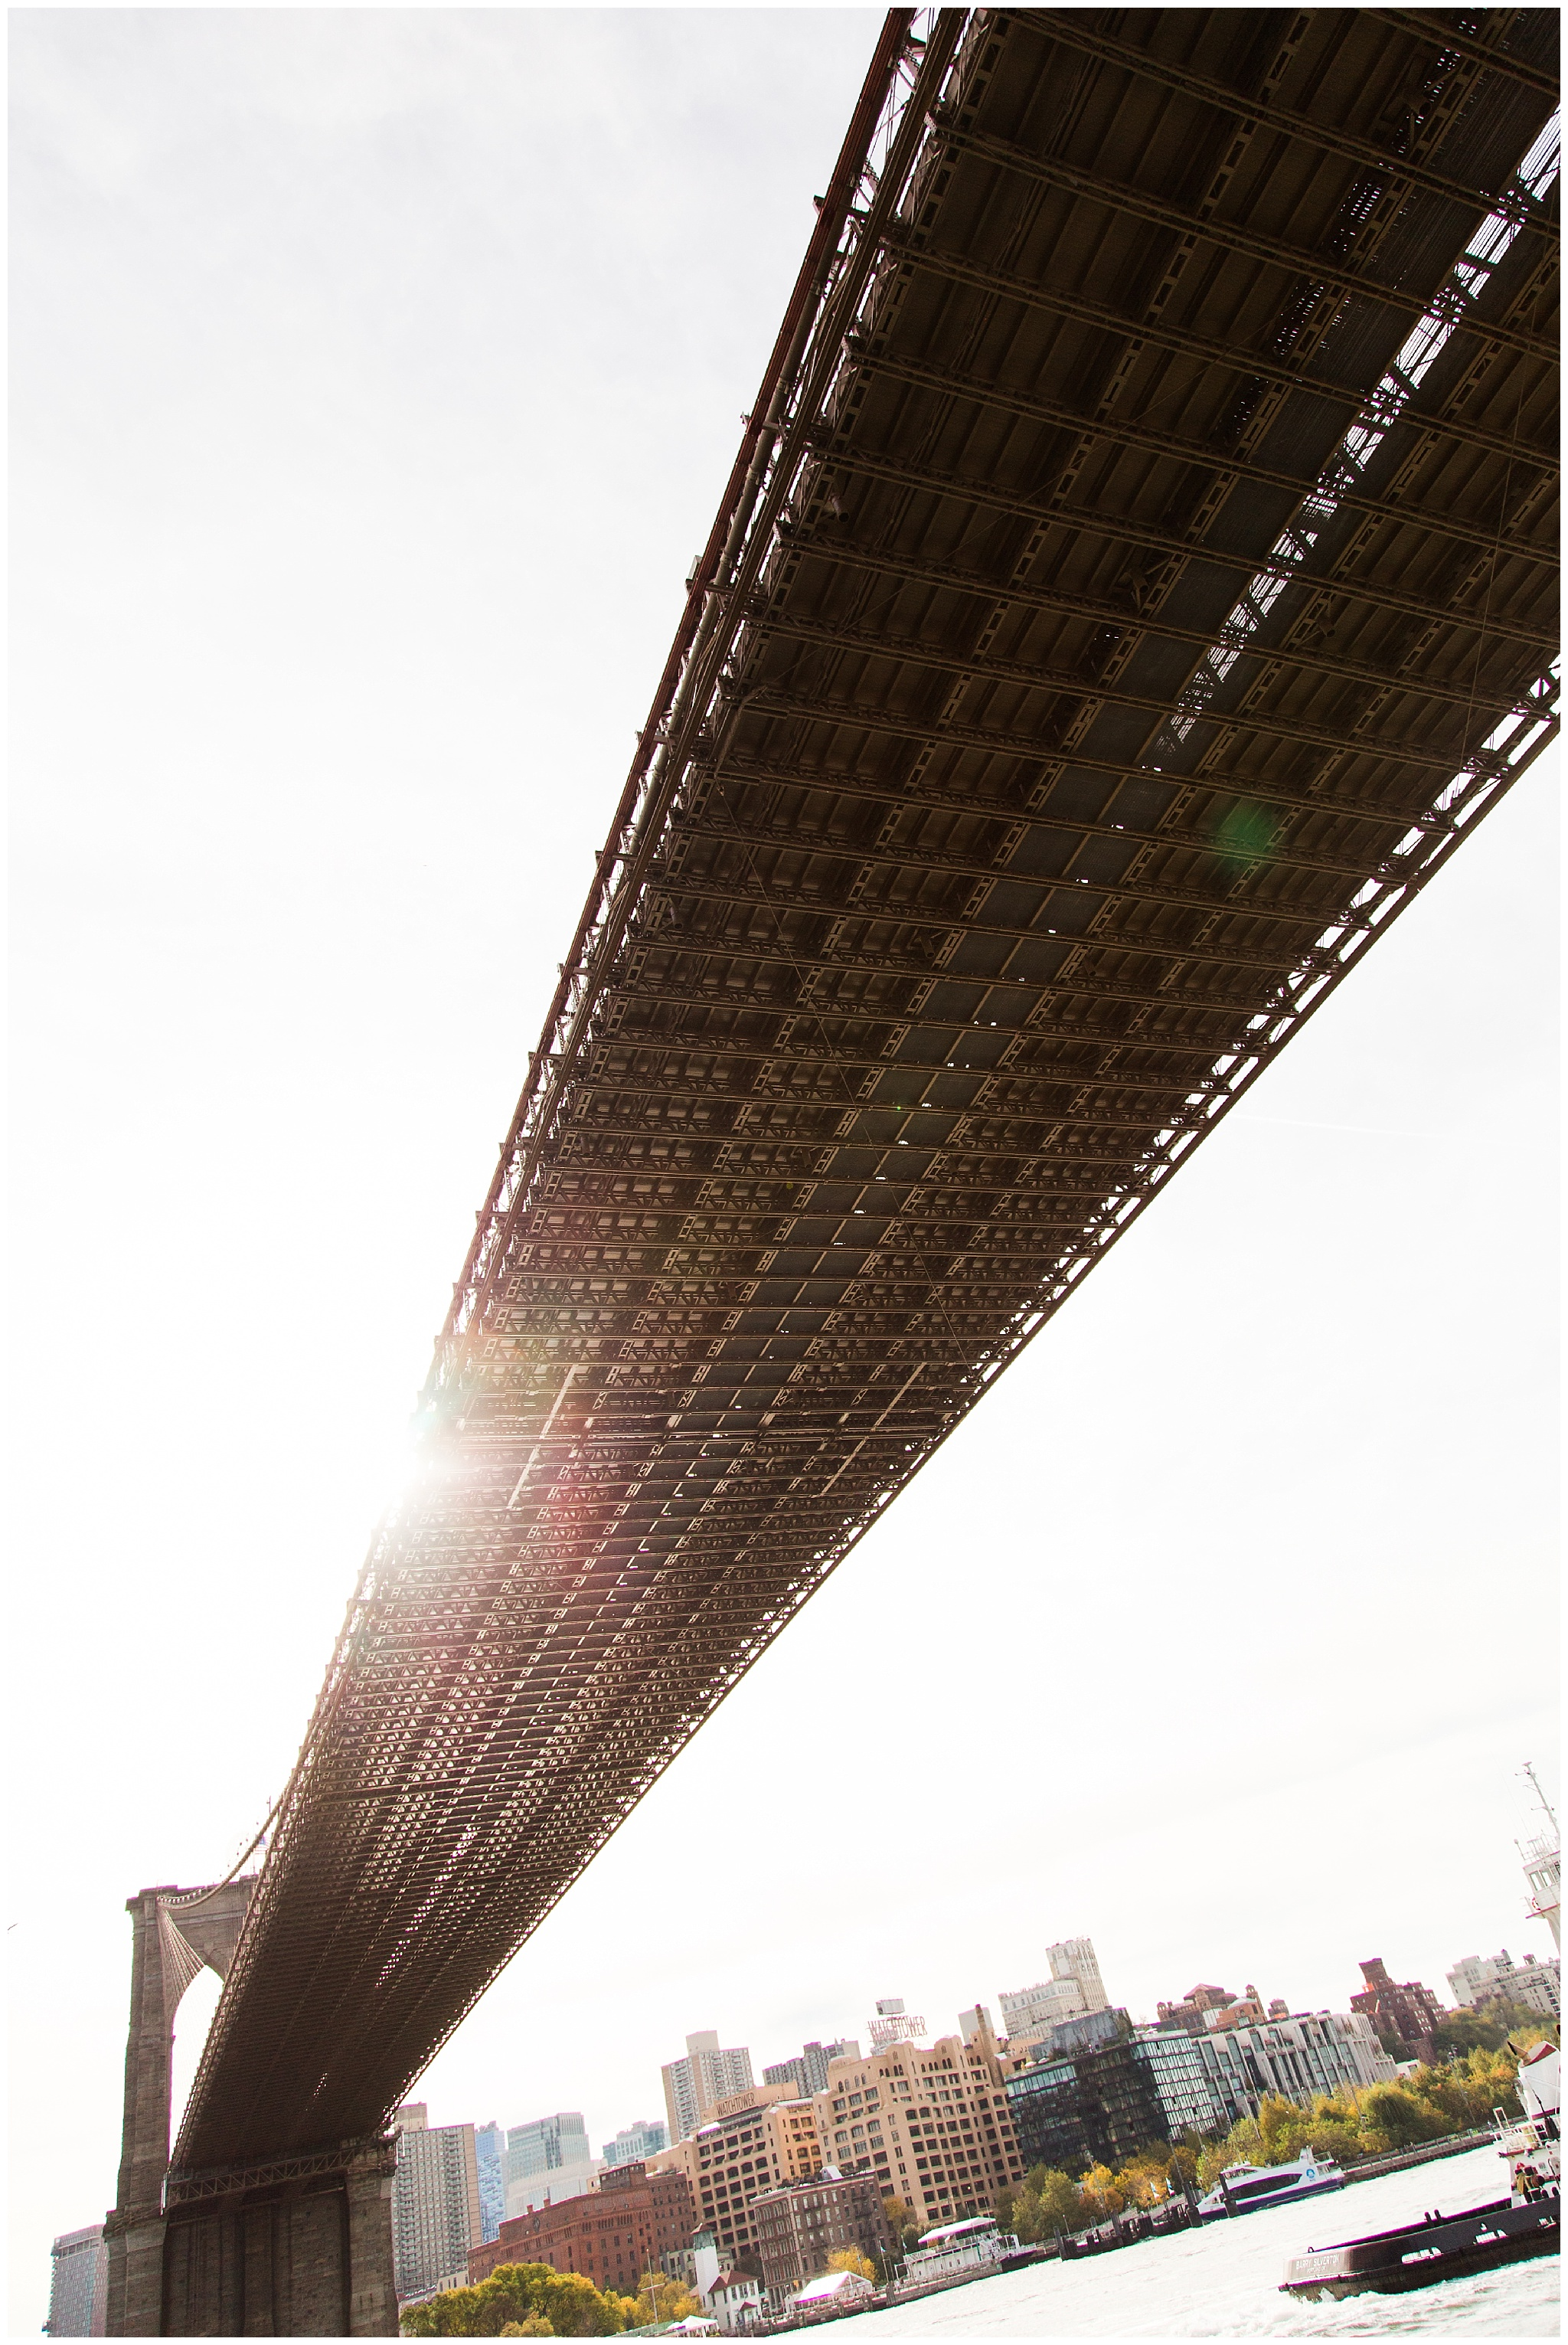 NYC_0047.jpg